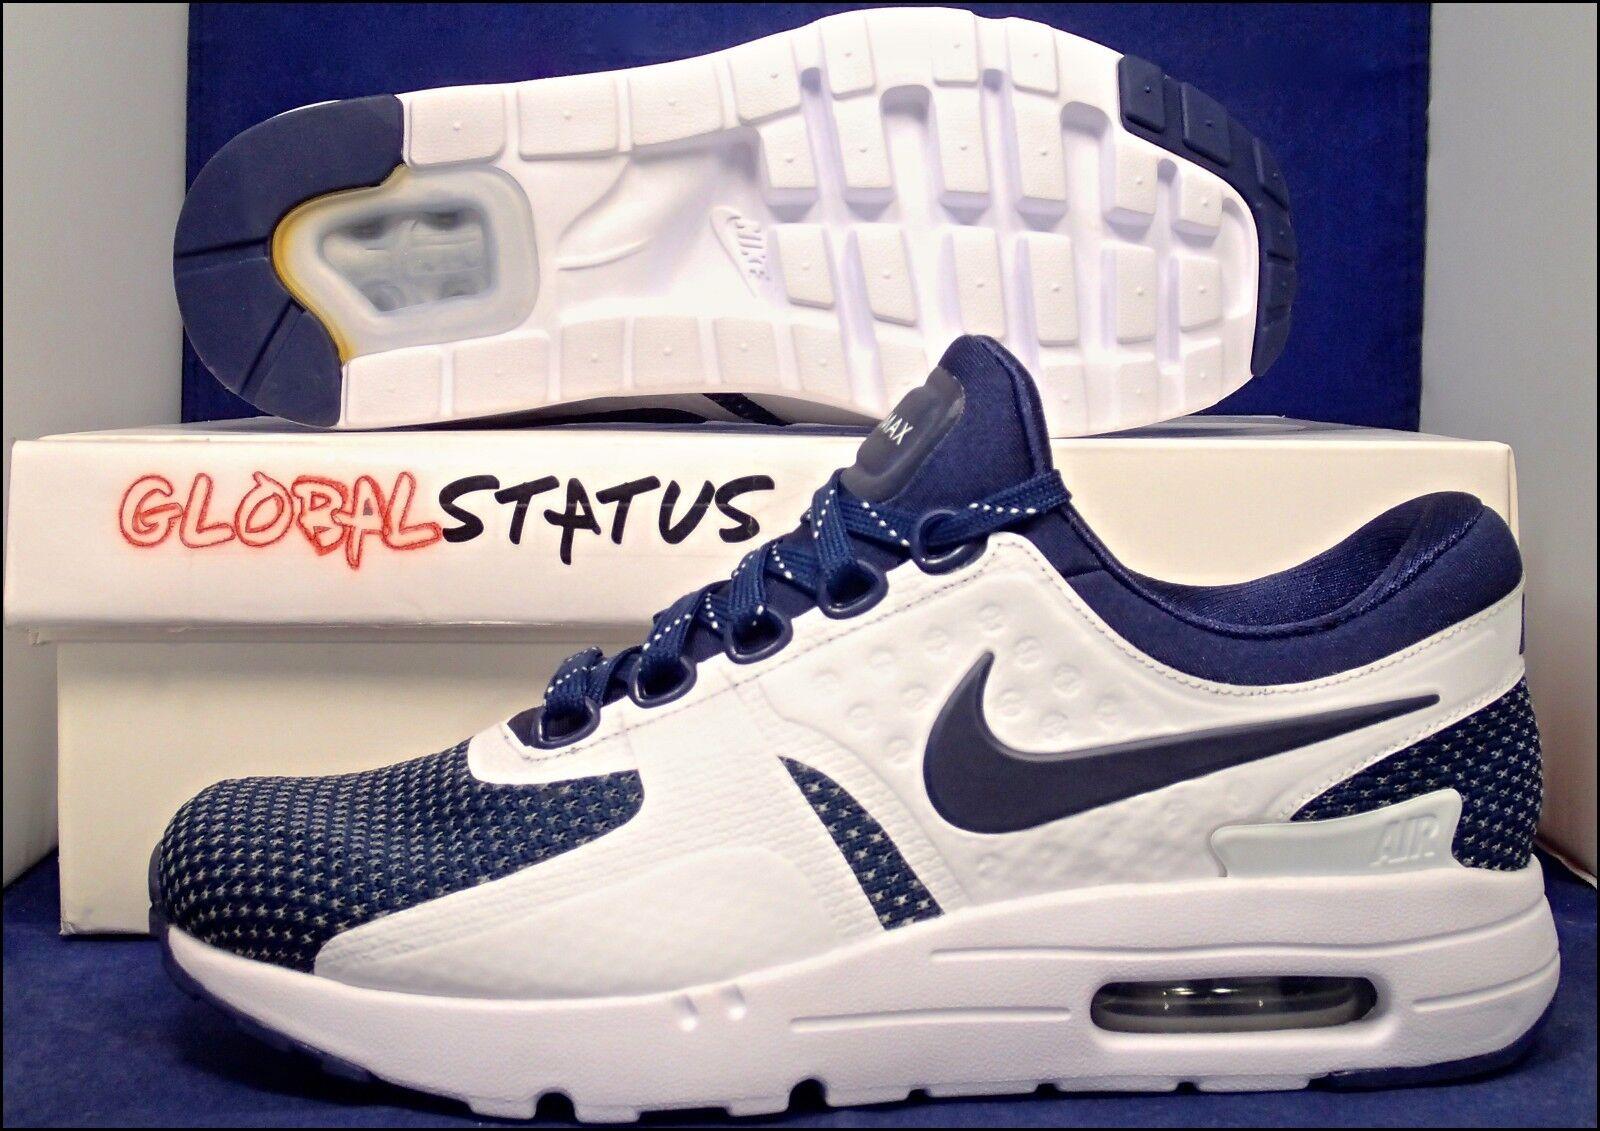 ID de Nike Air Max Zero Midnight Navy zapatos Azul zapatos Navy blancos 853860 901 hombre mujer 8 6,5 519640